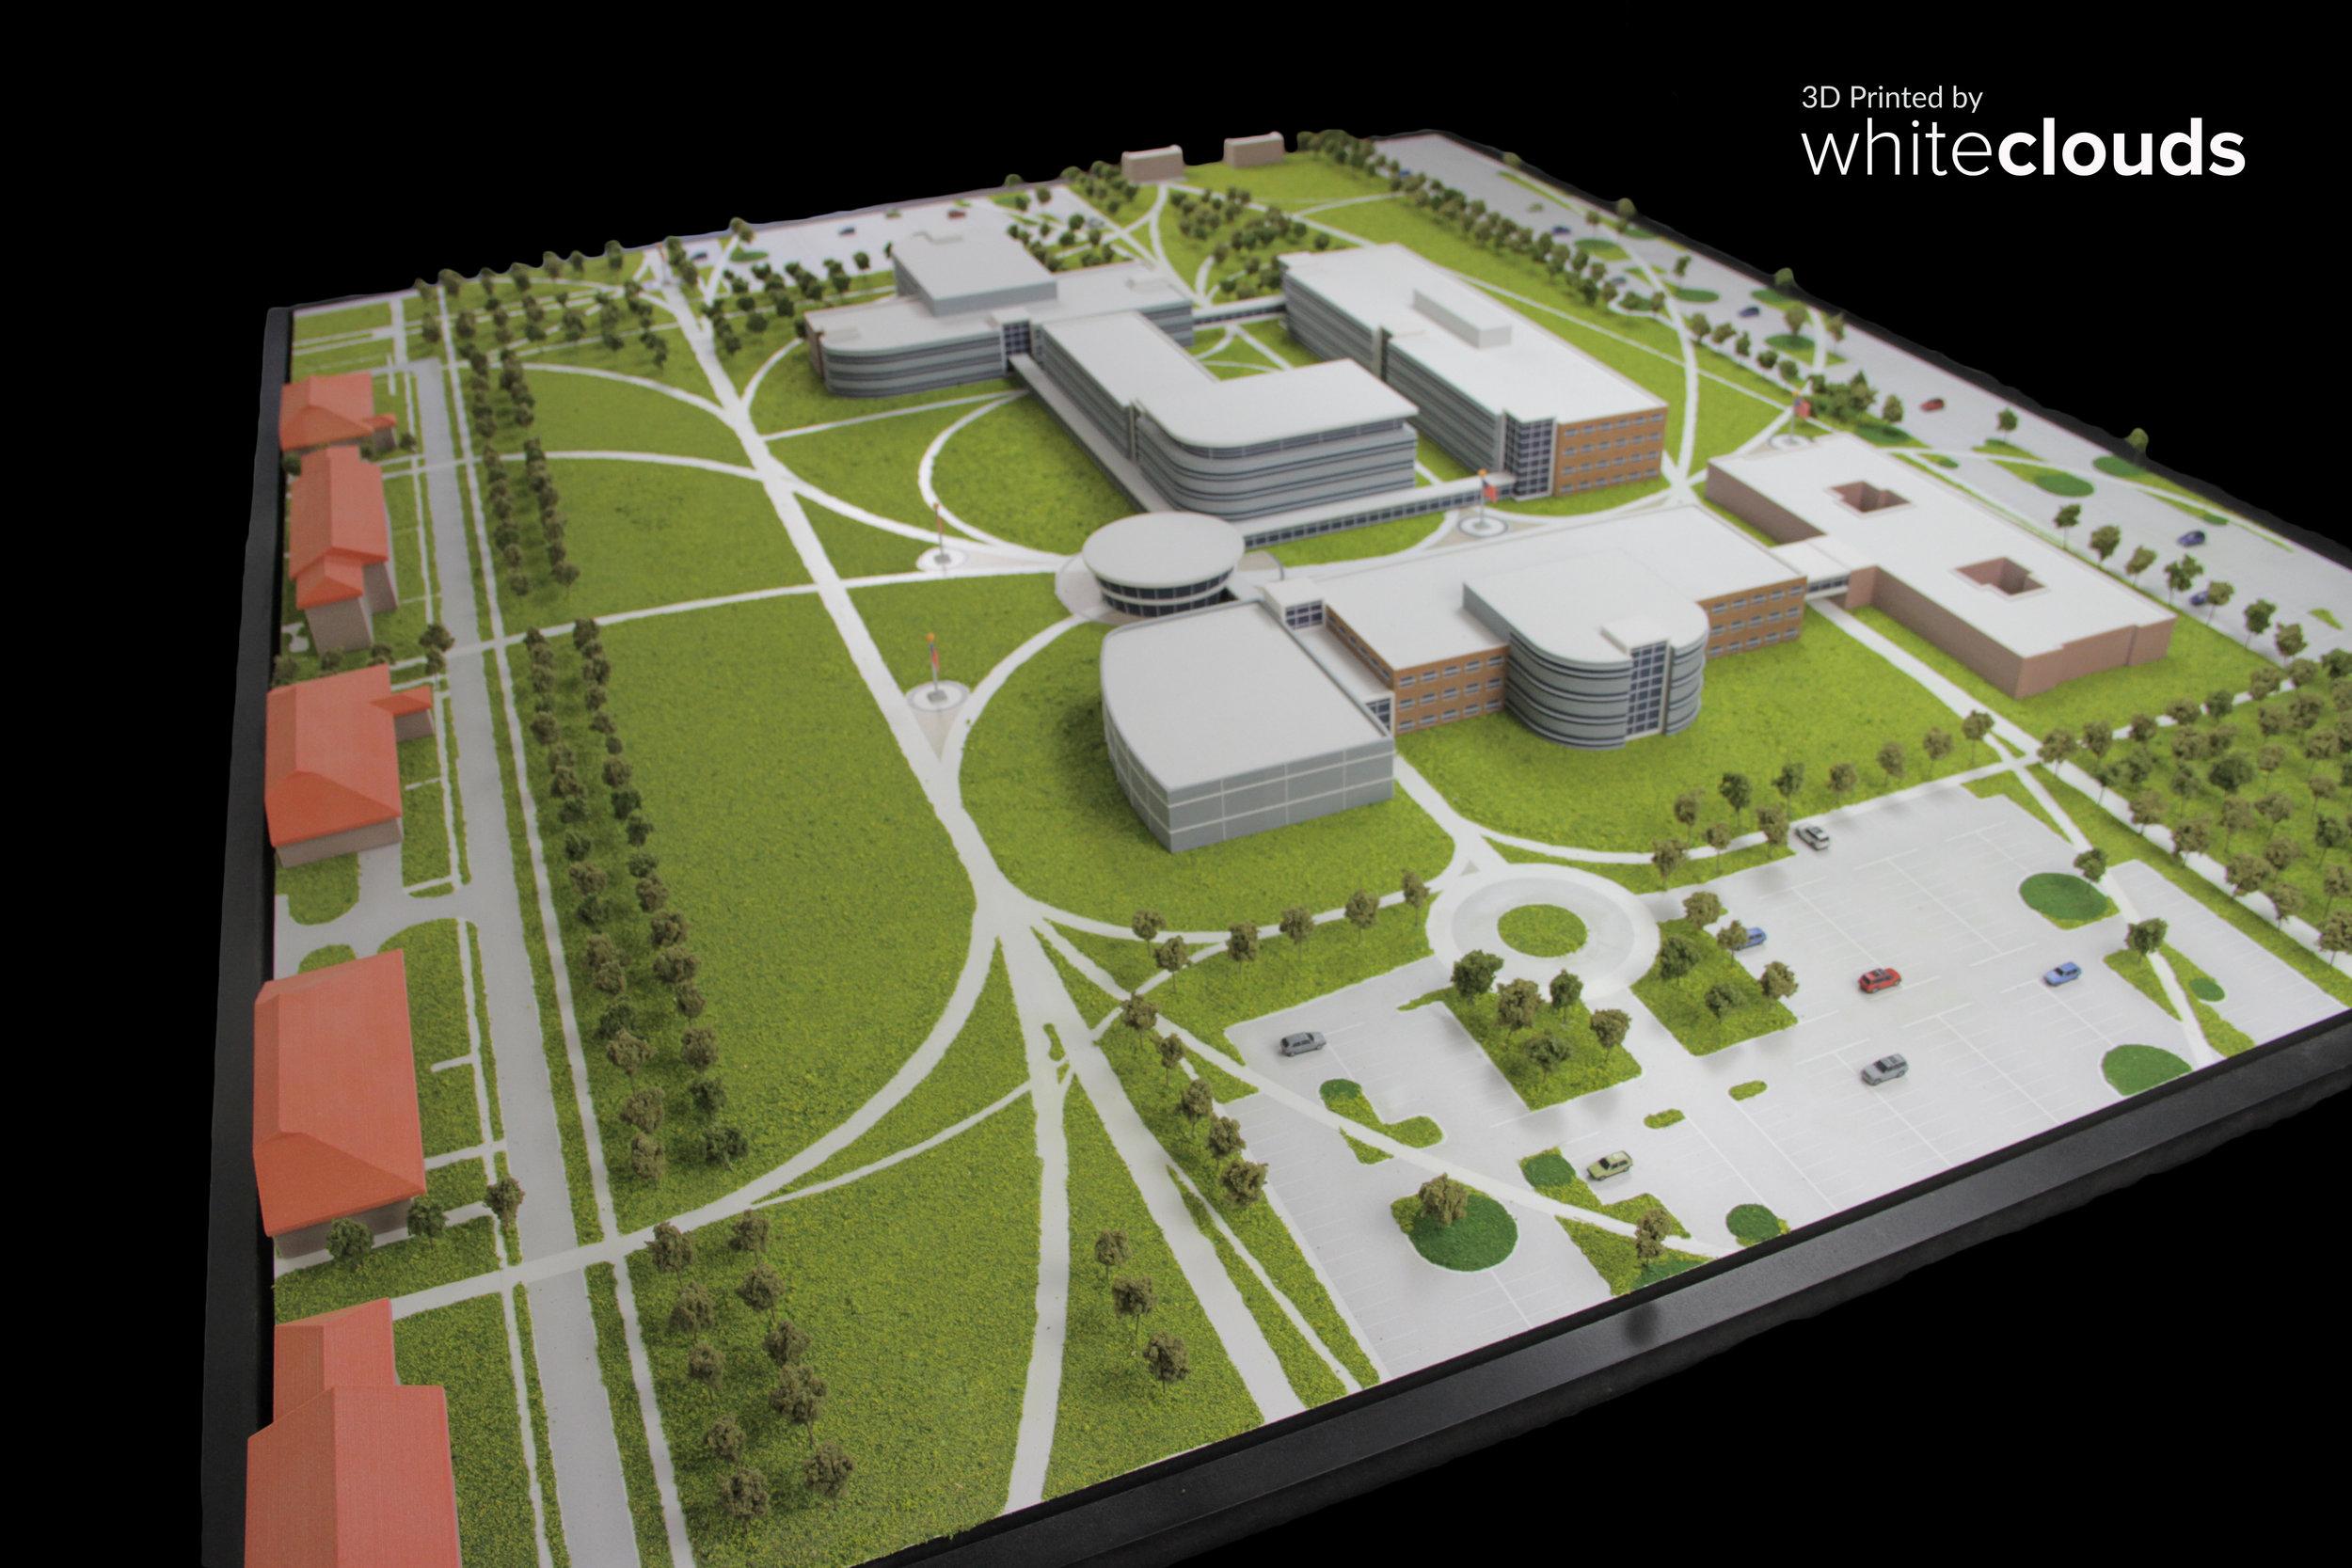 3D-Printed-WhiteClouds-Fort-Gordon-Architecture-Fort-Gordon-Website-4.JPG